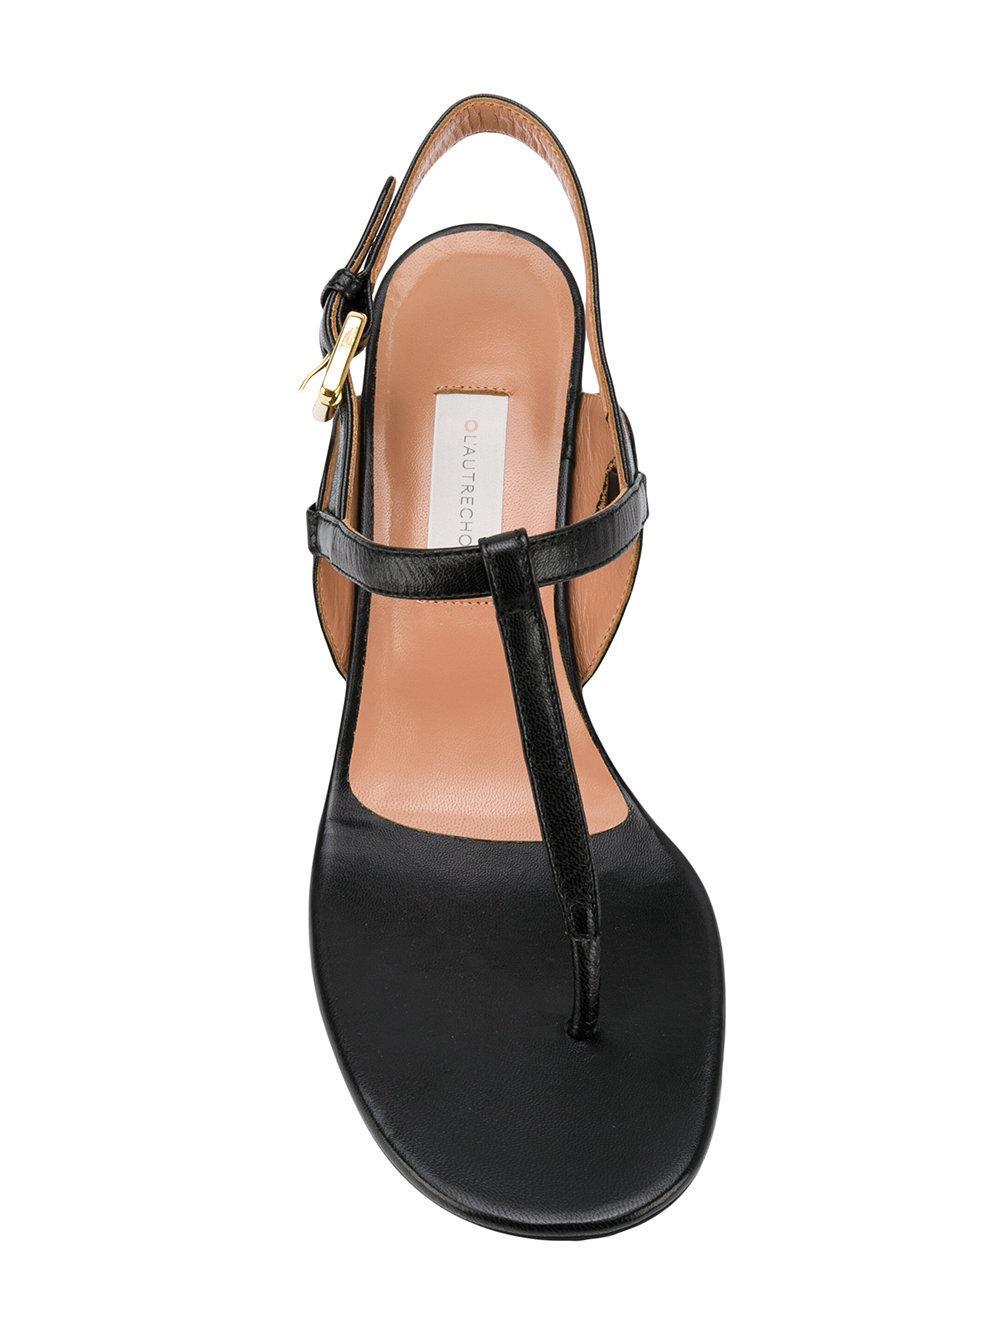 Lyst L Autre Chose Block Heel Thong Sandals In Black